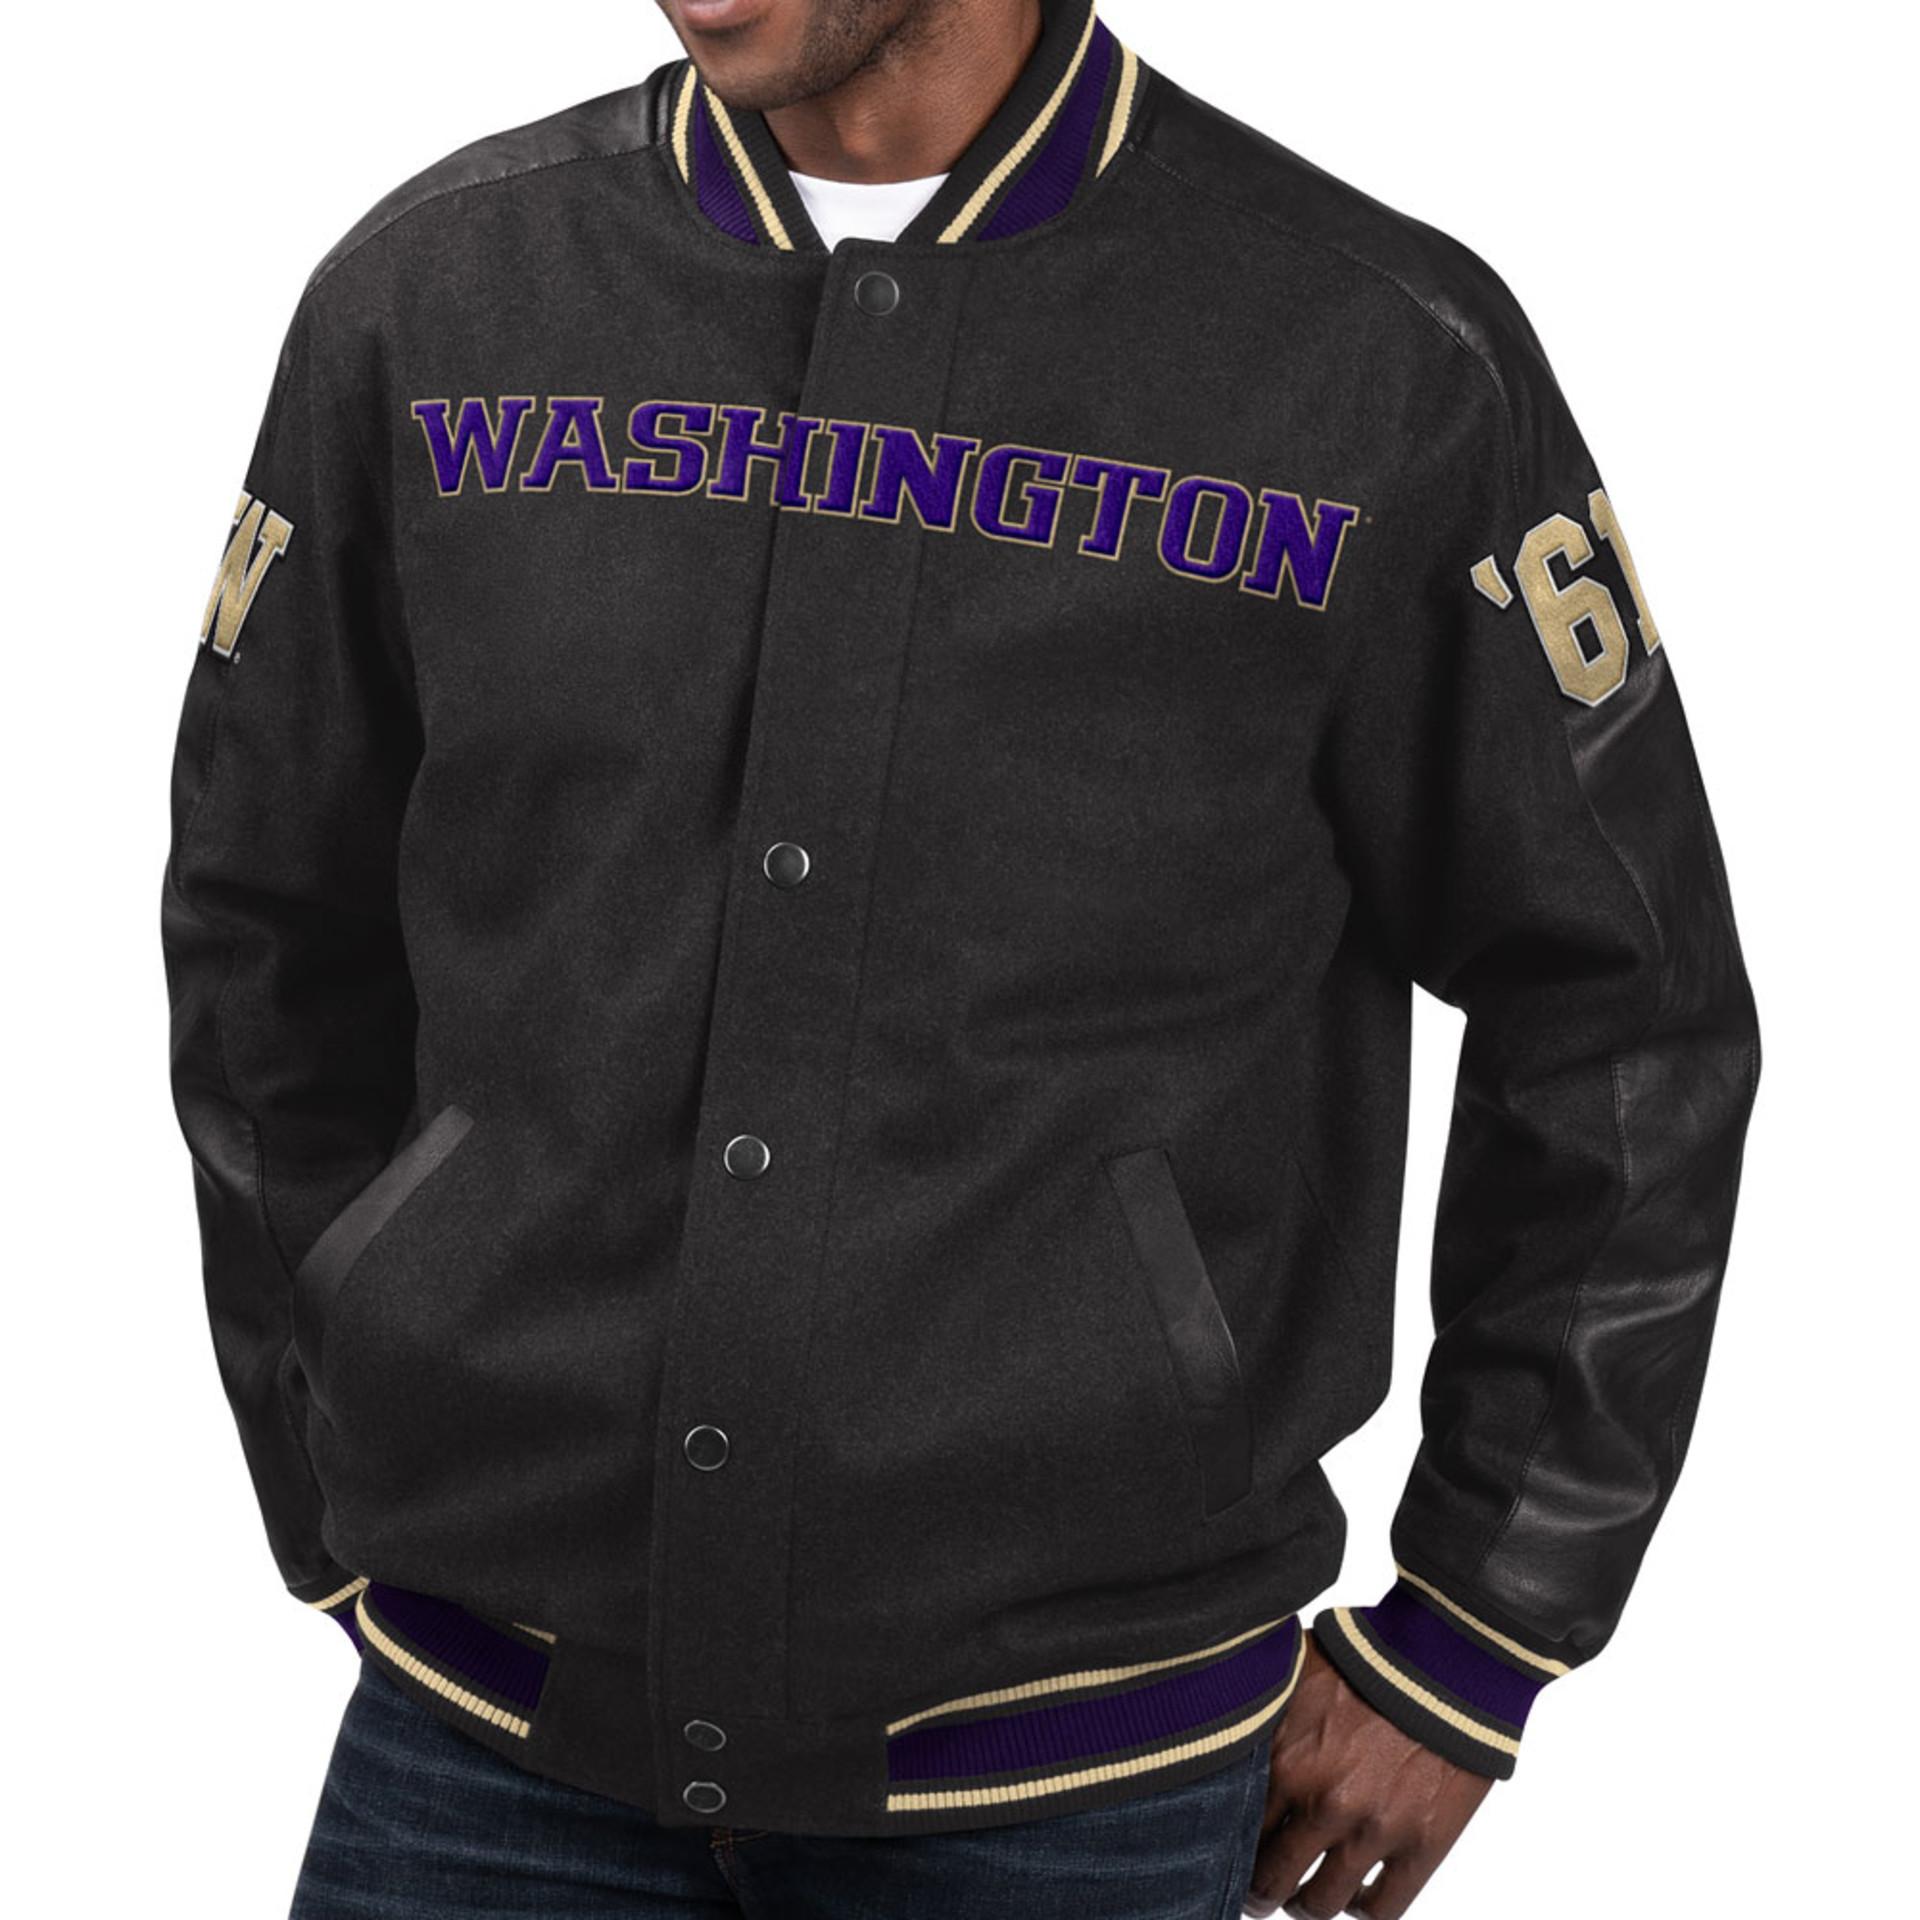 G-III Men's Washington '61 Scrimmage Varsity Jacket